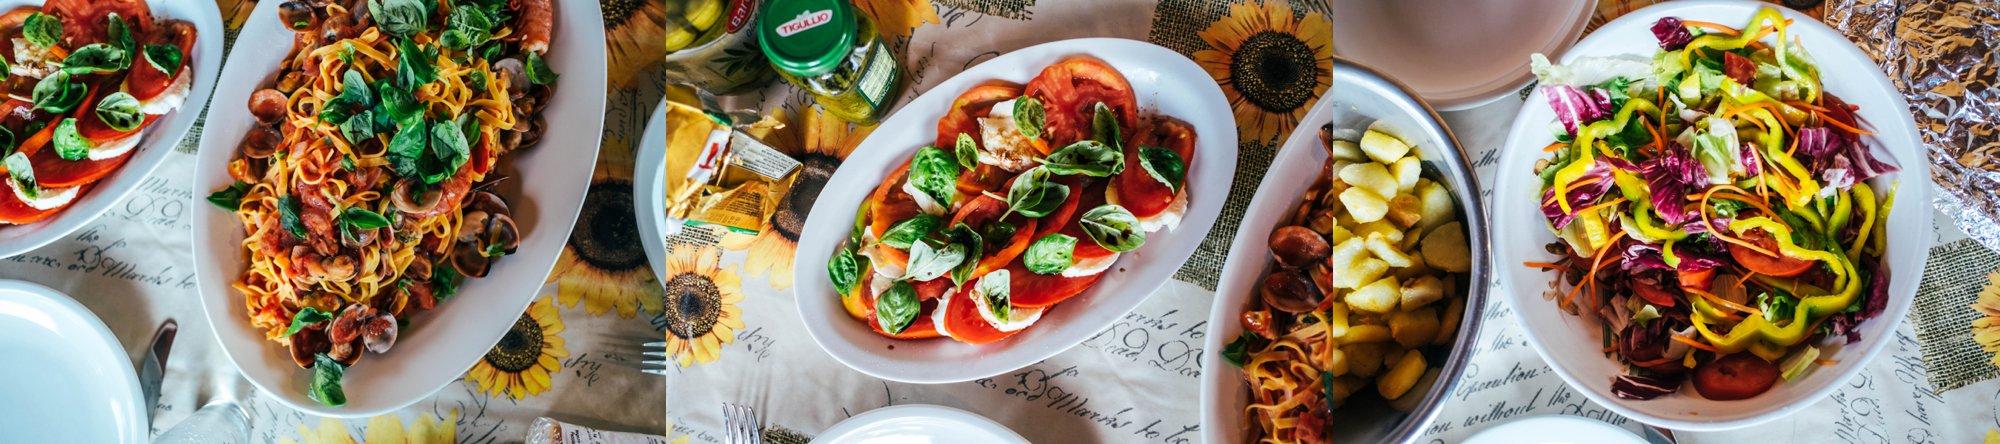 Table of Italian Food Essex Documentary Travel Photographer